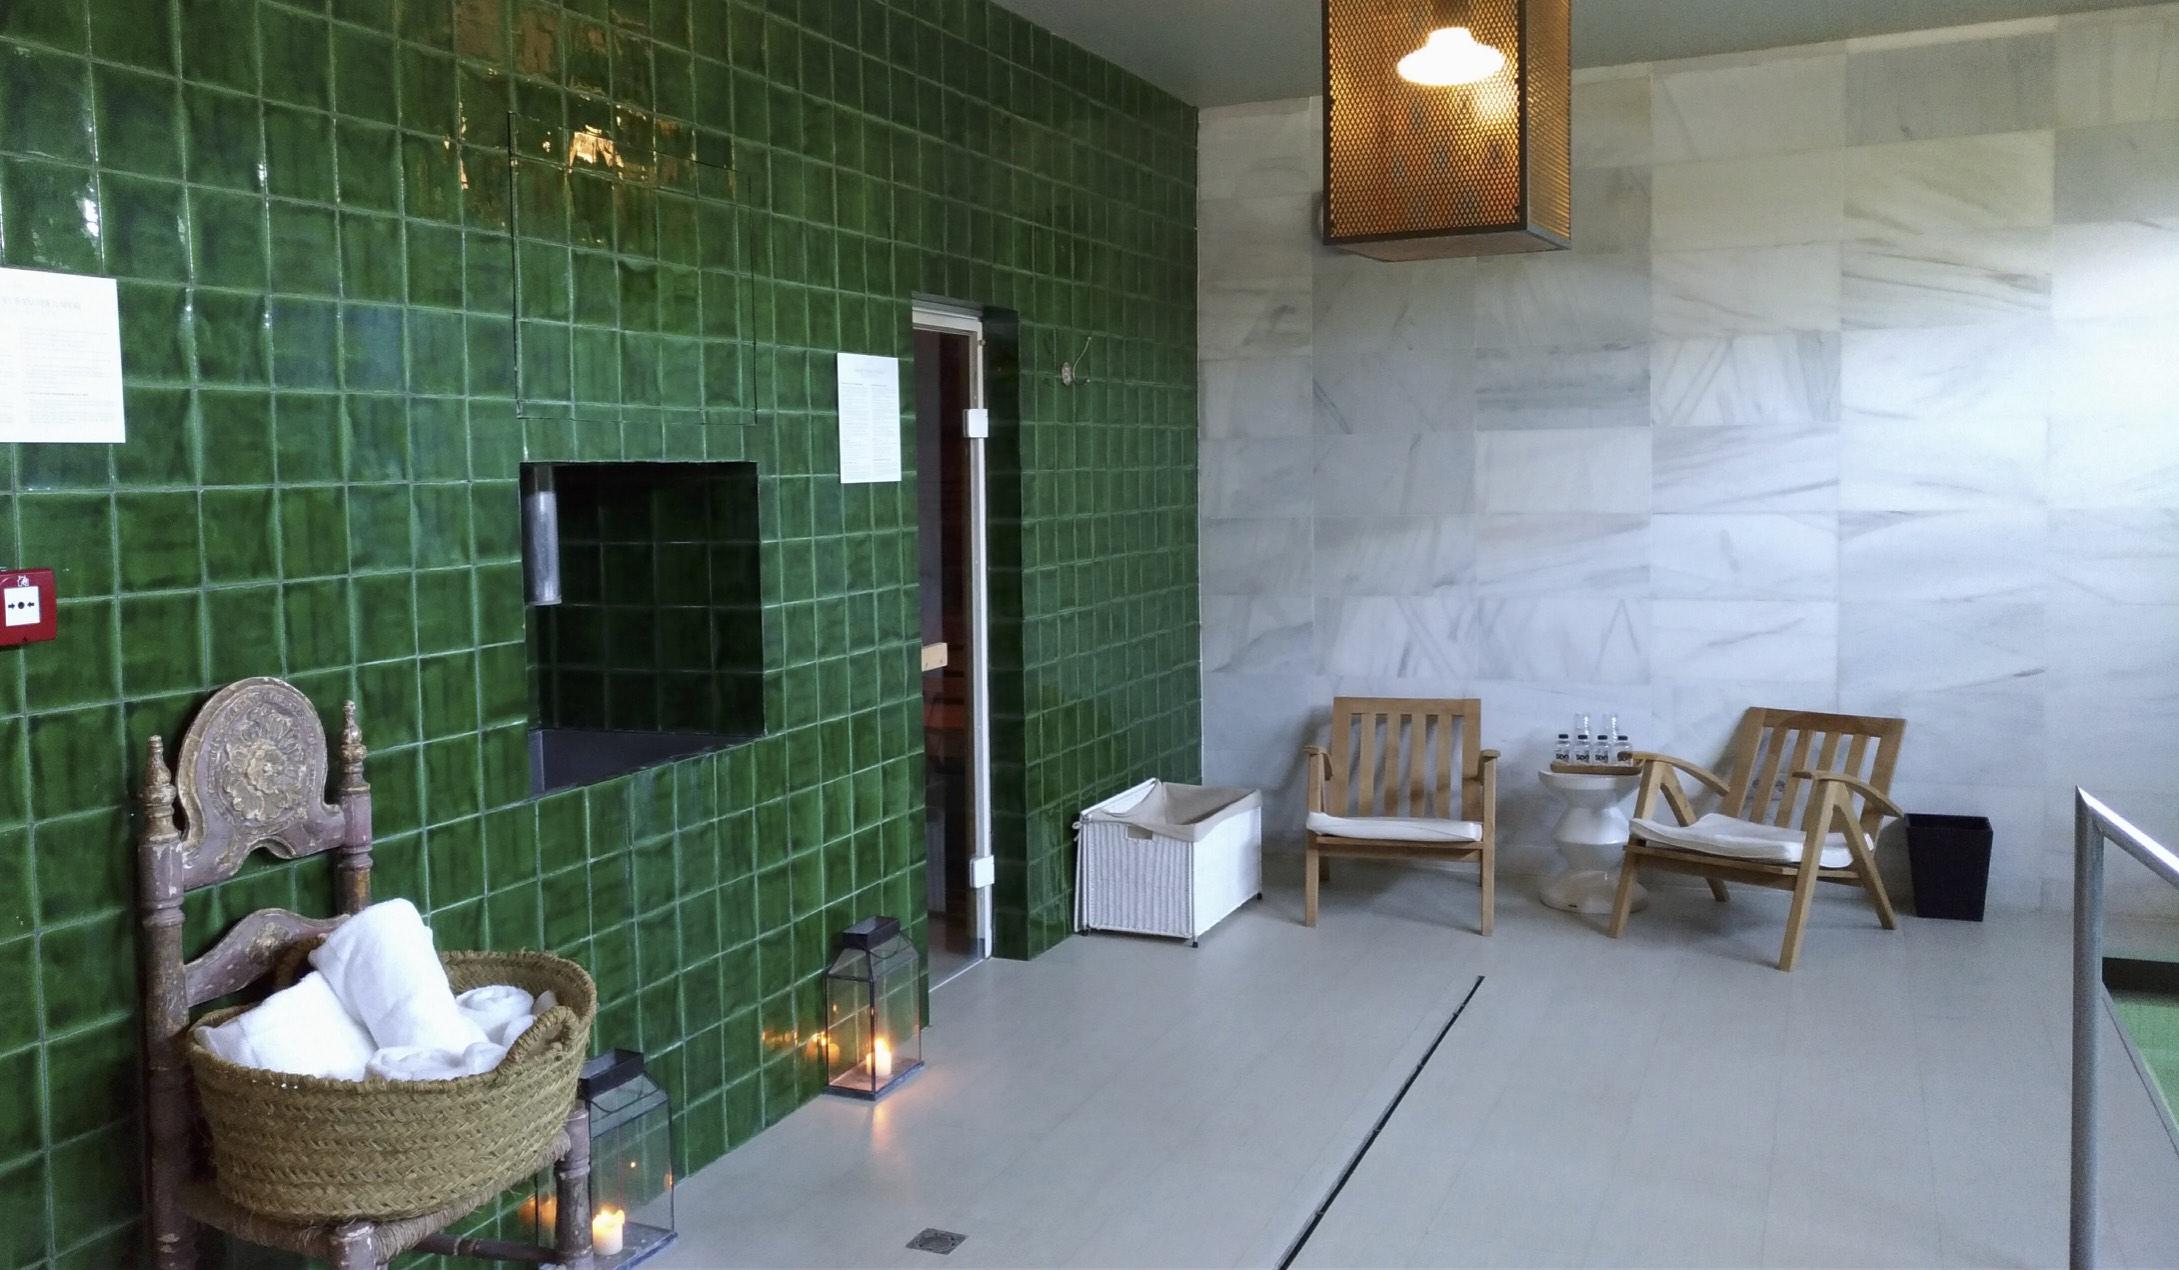 Espace repos du sauna et du hammam travel style life for Espace sauna hammam